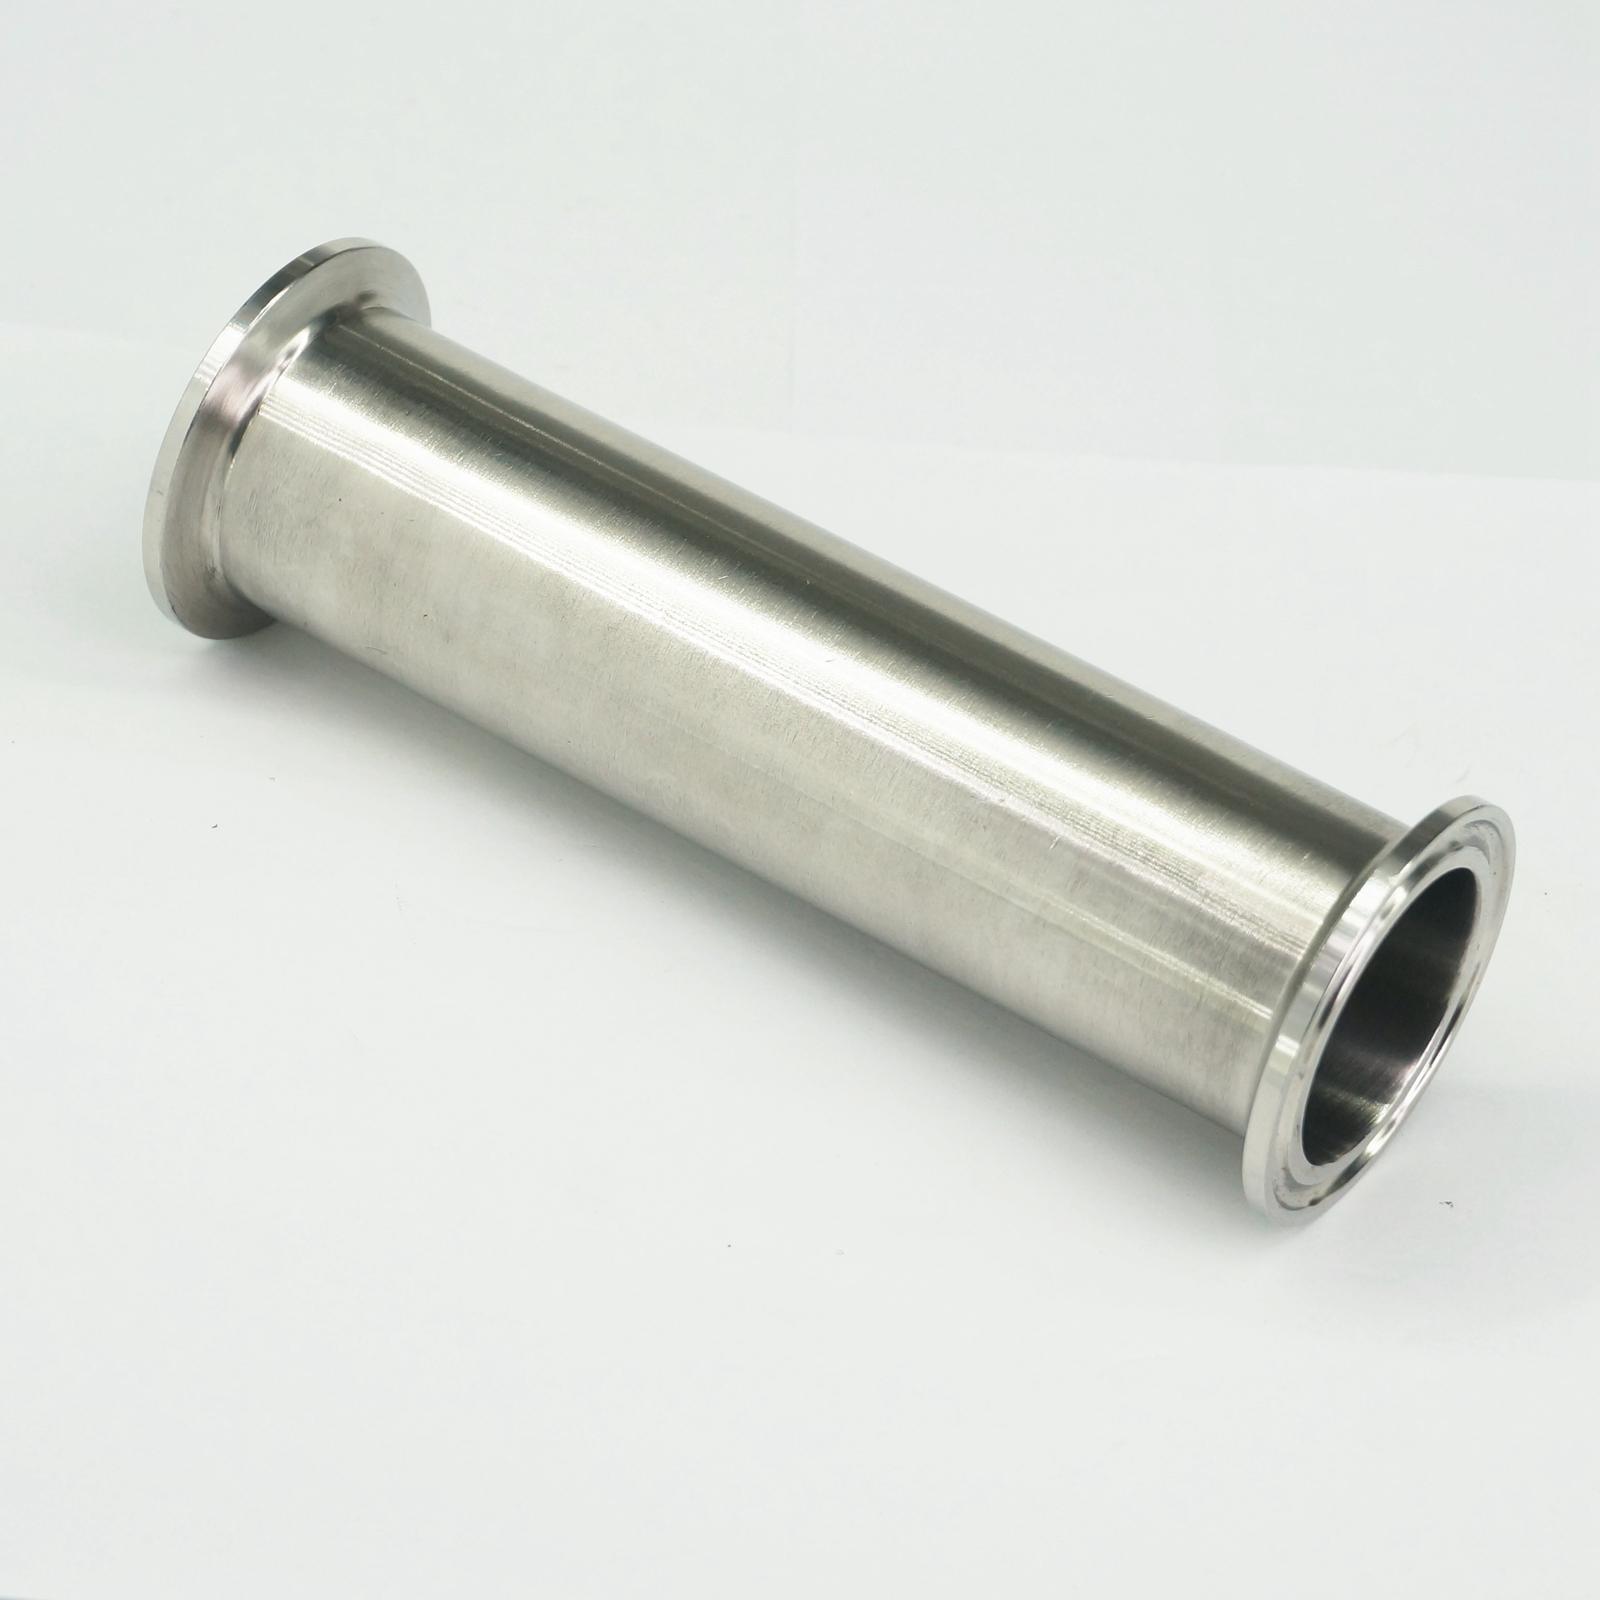 6 Brillant 1,5 tri Clamp X 38mm Od Rohr Sanitär Spool Rohr Länge 152mm Für Homebrew Sus304 Edelstahl